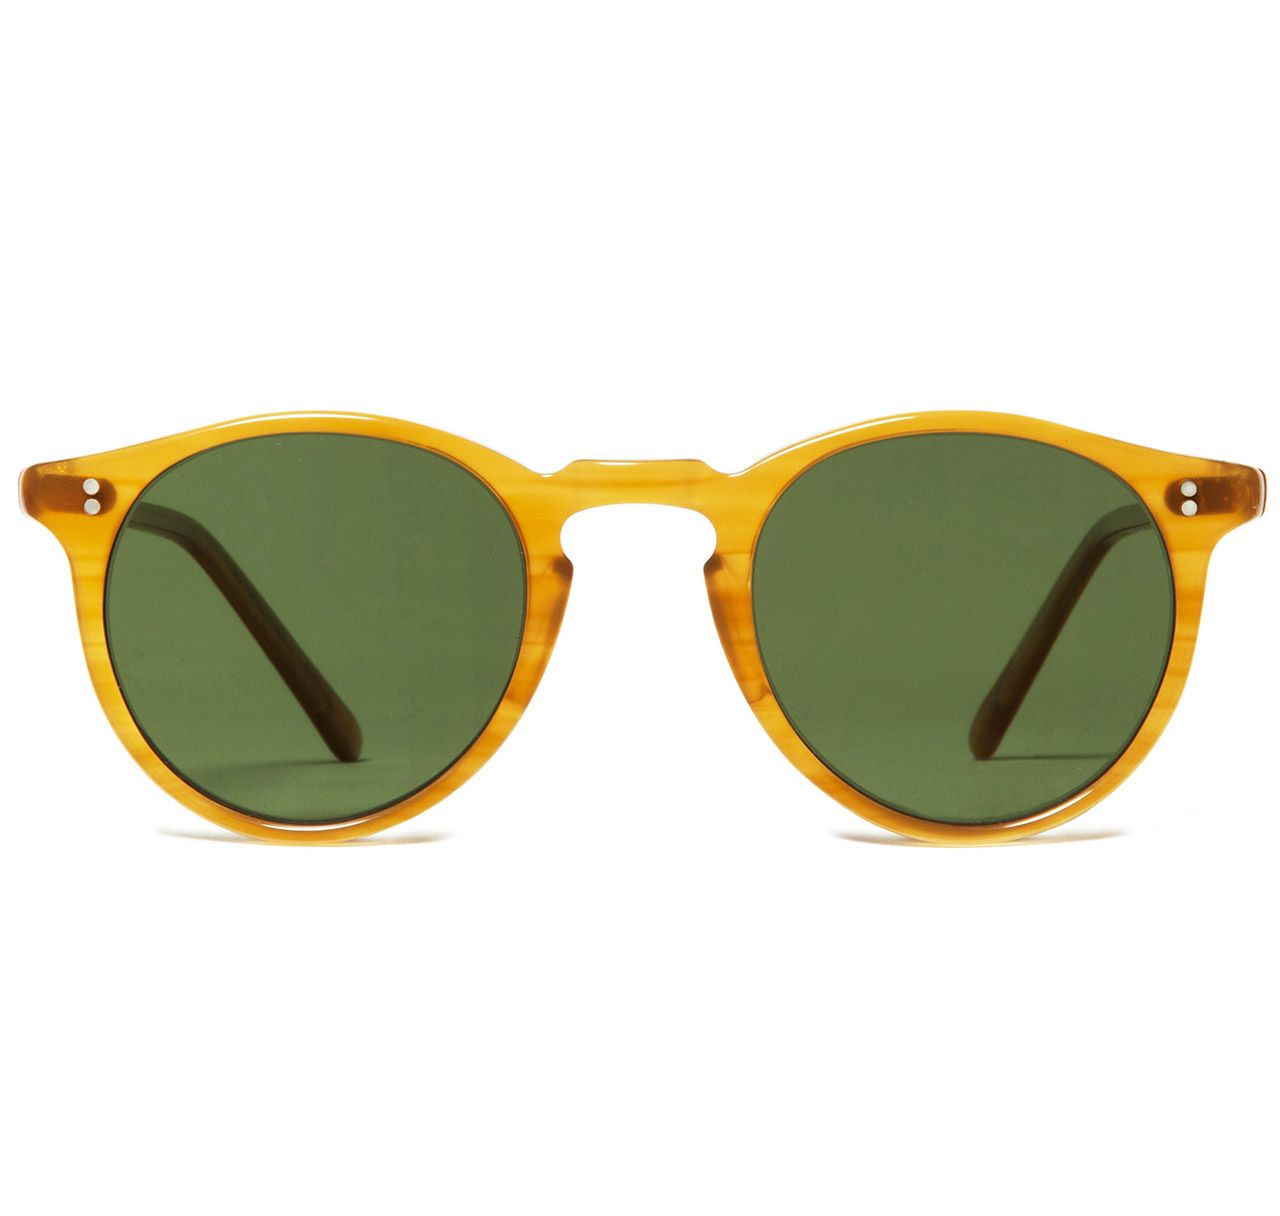 b4e970e35 Randolph Engineering 'Sportsman' 57mm Sunglasses   Nordstrom   =¤= WATCH'S  & SHADES =¤-¤=   Pinterest   Sunglasses, Gold sunglasses and Mens glasses